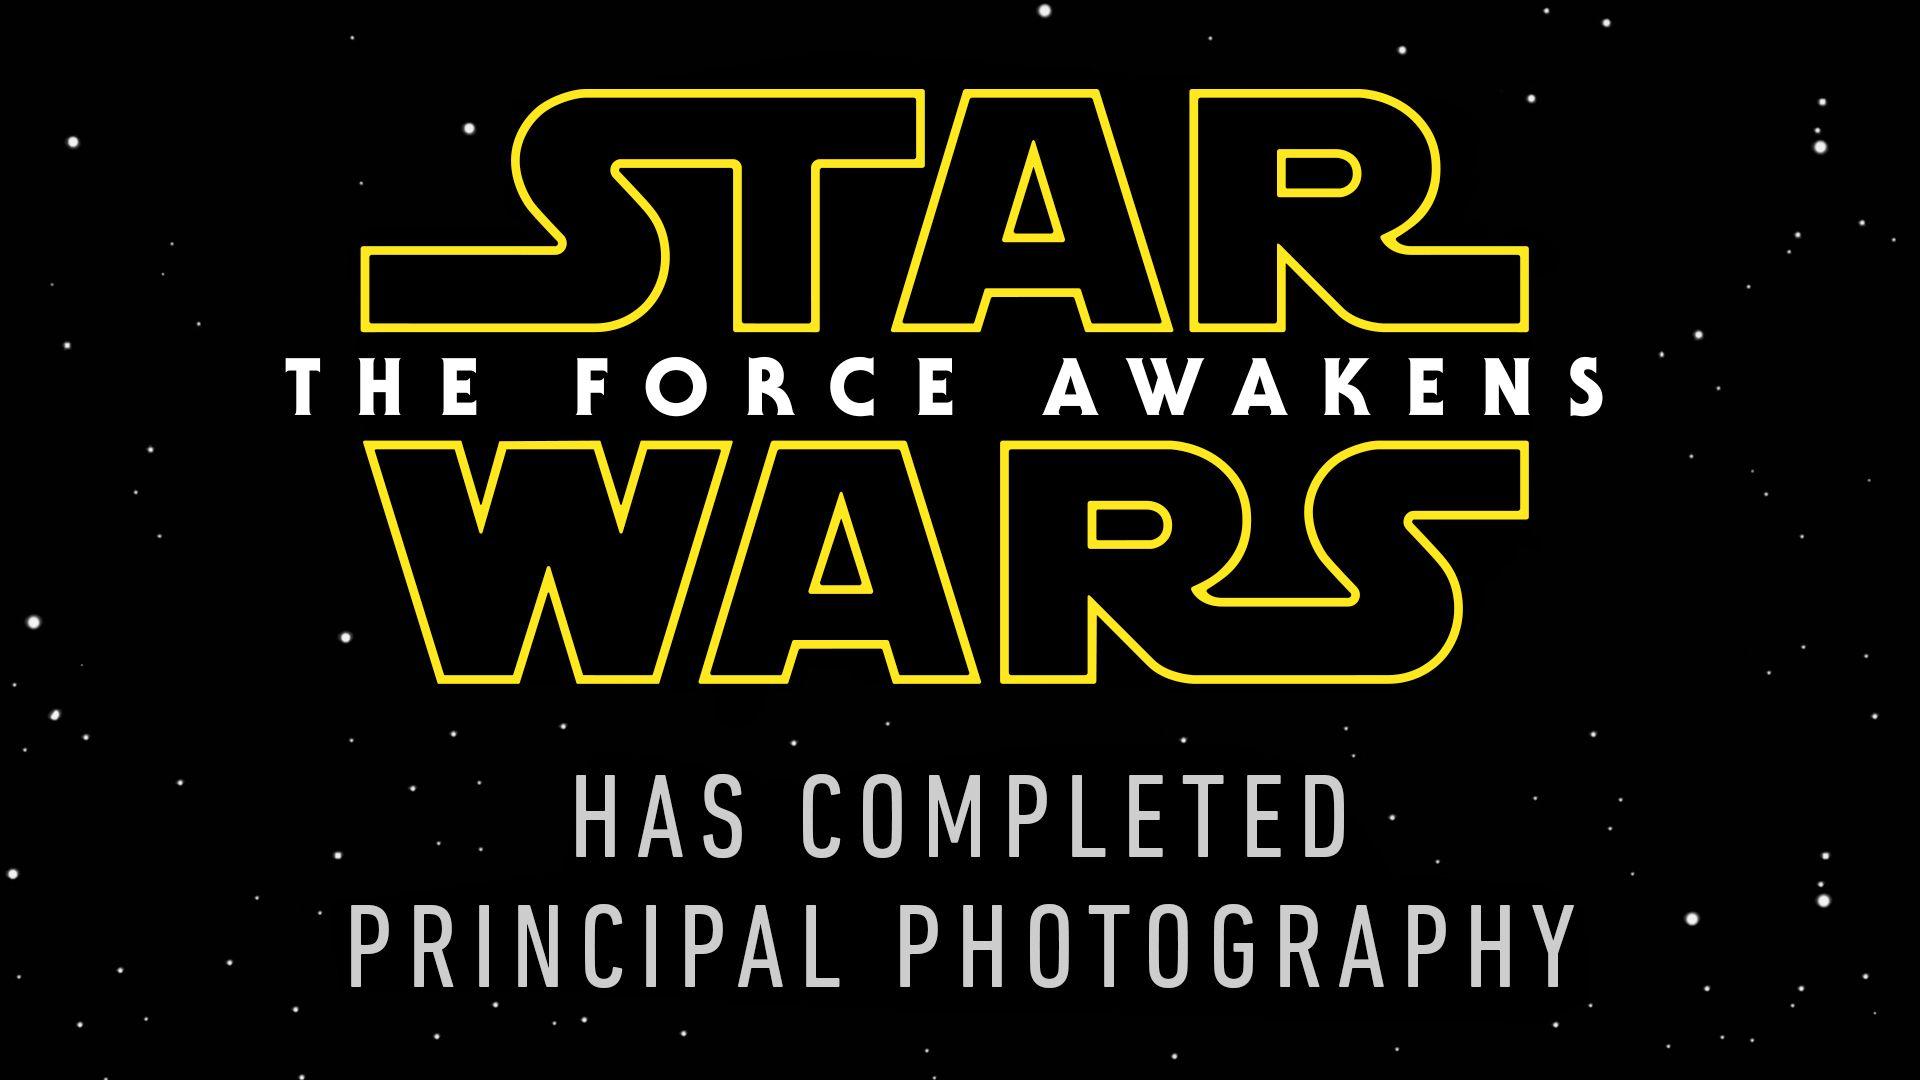 Star Wars Episode VII, Star Wars Rebels